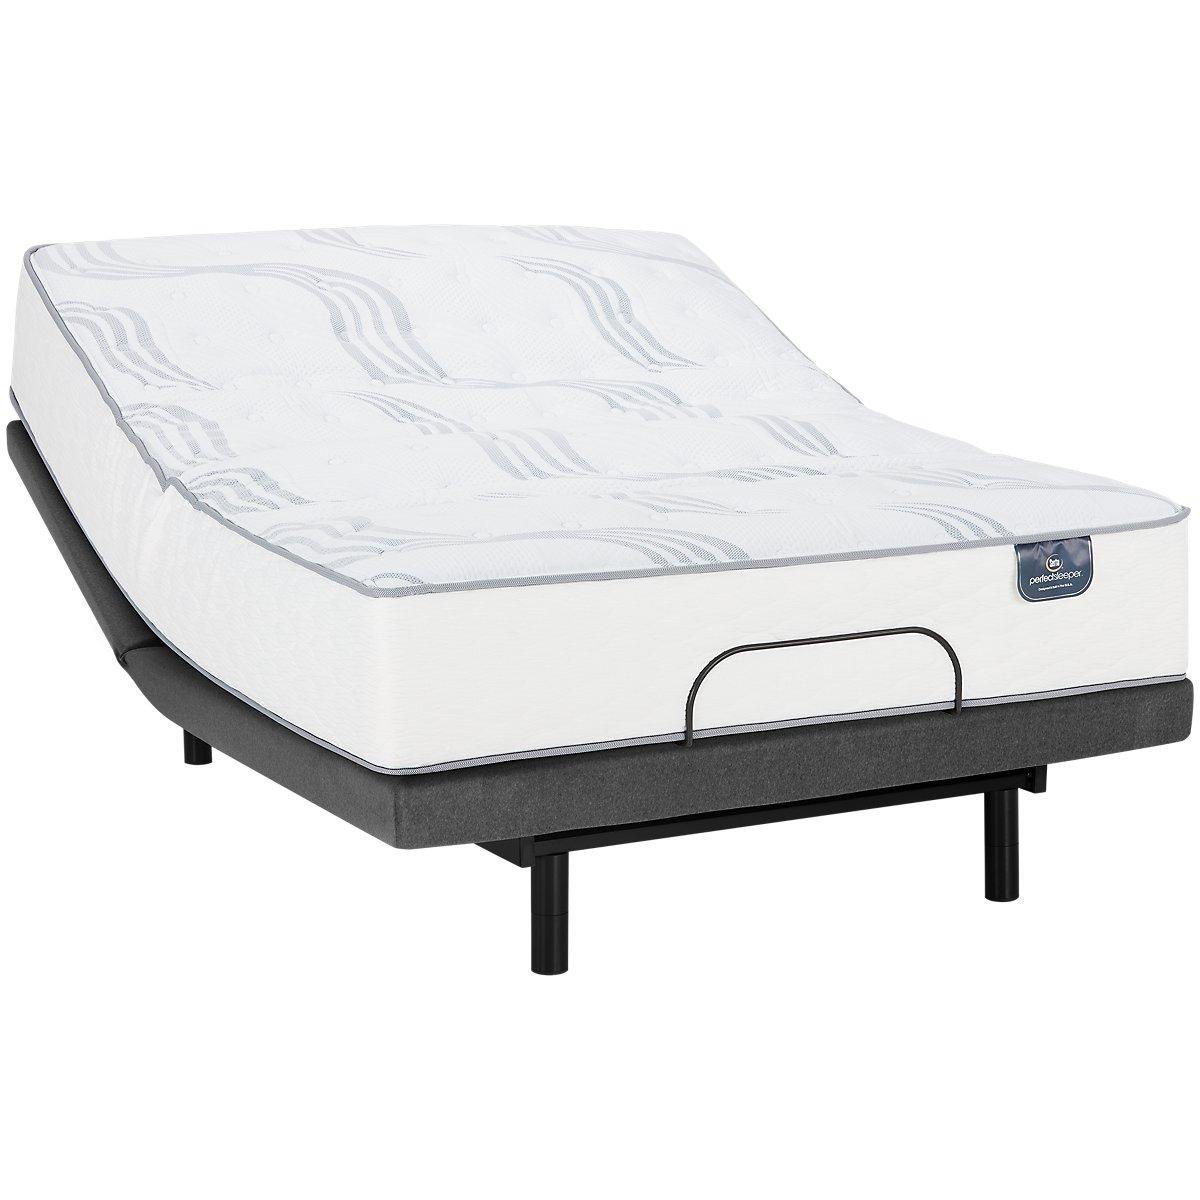 Serta Perfect Sleeper Blomquist Luxury Firm Mattress